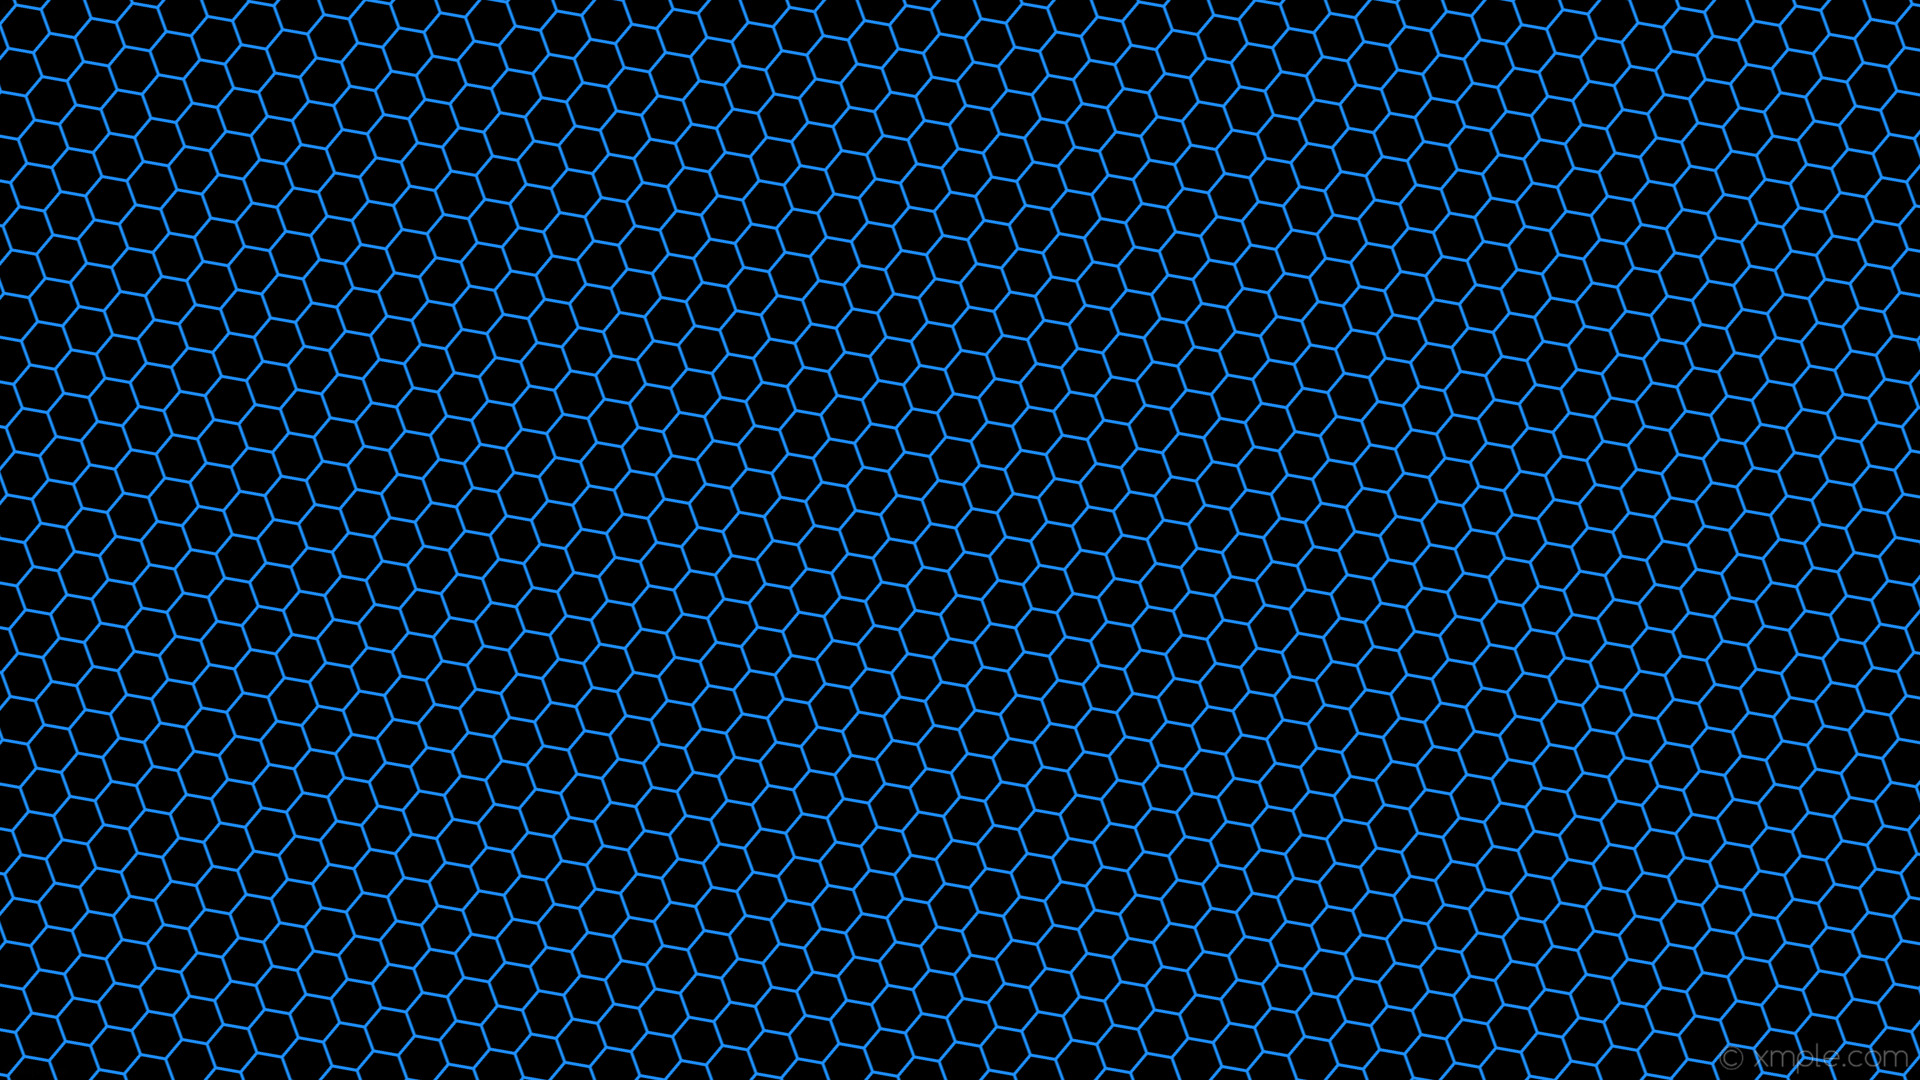 wallpaper drop shadow beehive black hexagon blue dodger blue #1e90ff  #000000 60° 3px